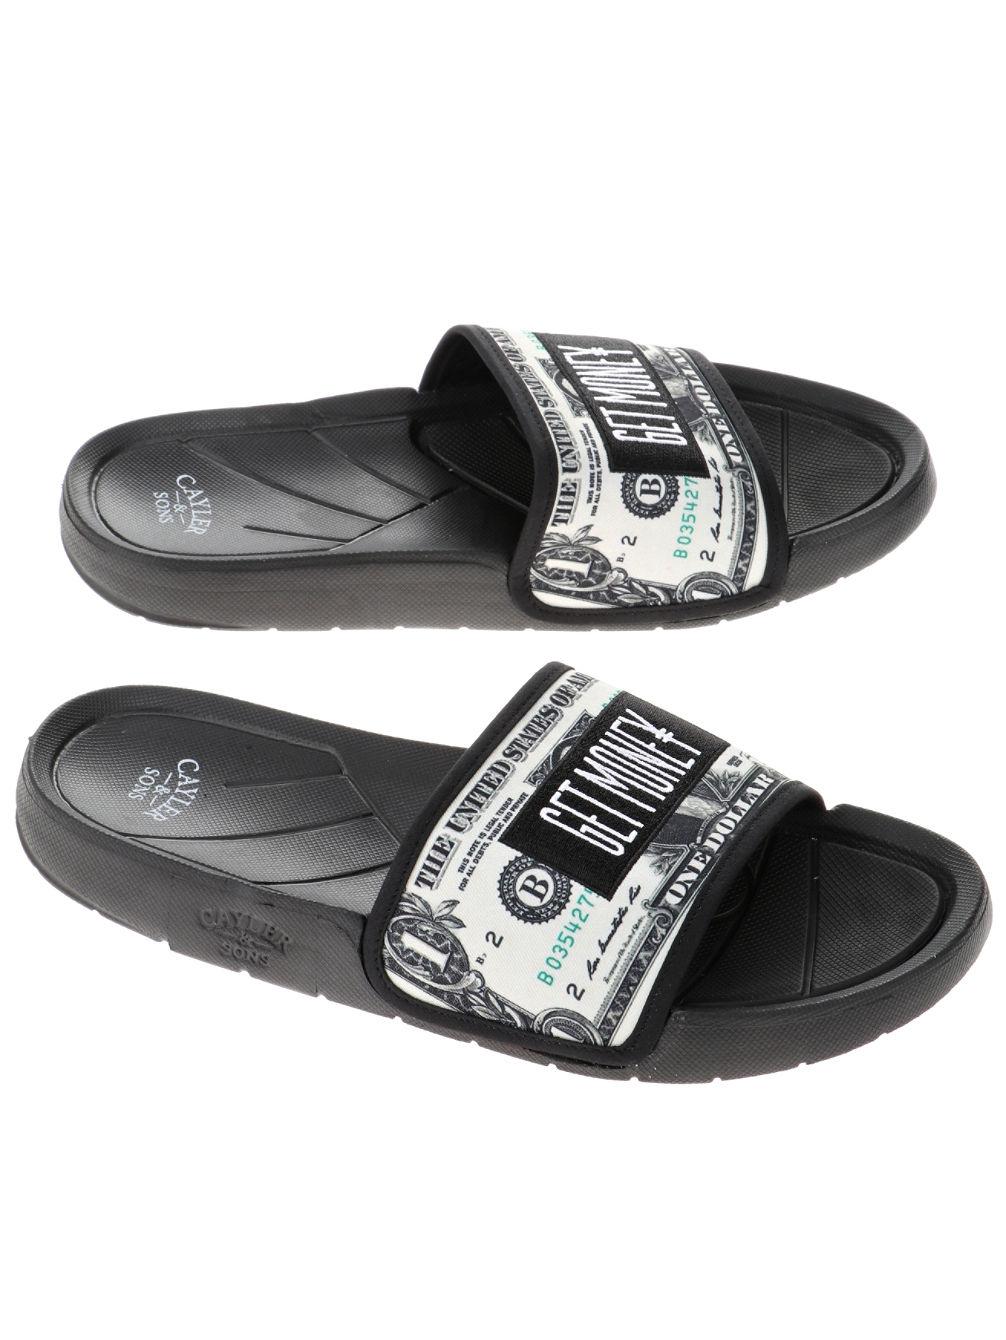 get-money-sandals